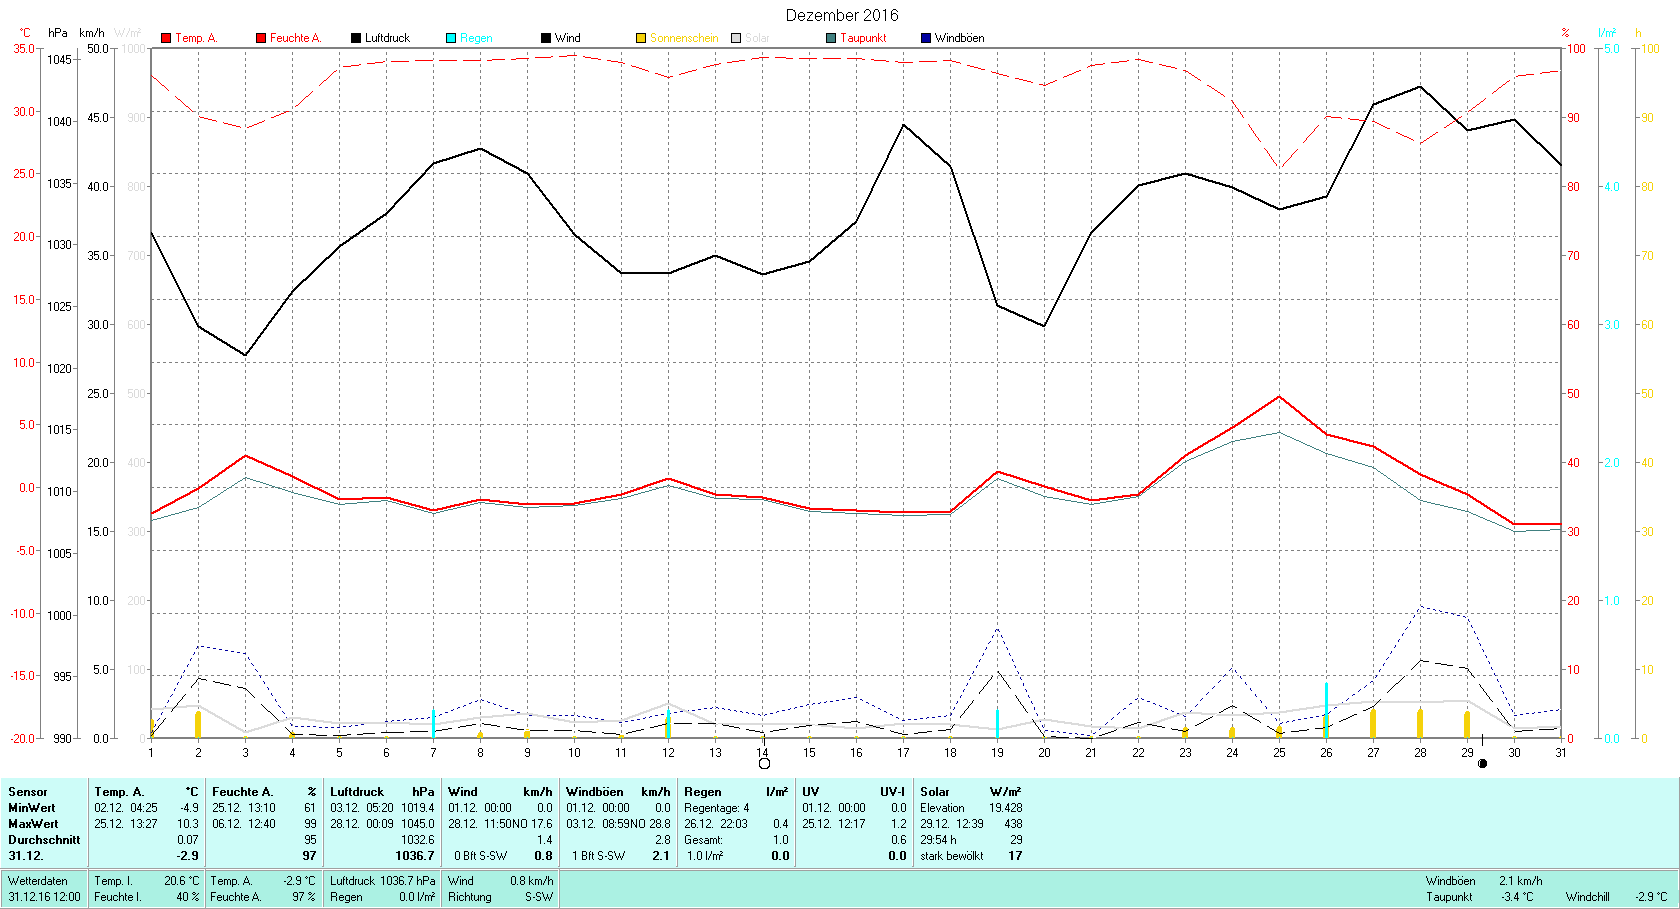 Dezember 2016 Tmin -4.9°C, Tmax 10.3°C, Sonne 29:54h, Niederschlag 1.0mm/2